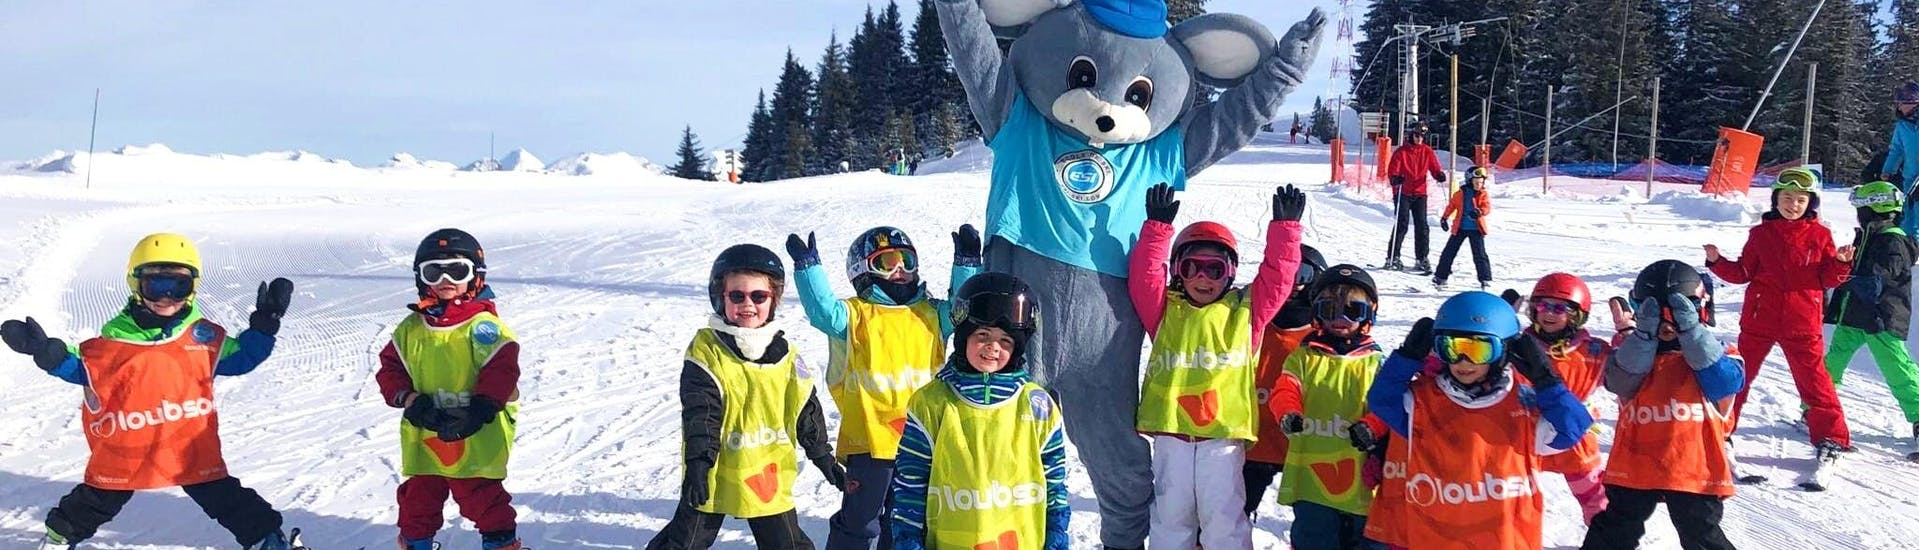 kids-ski-lessons-afternoon-les-carroz-esi-grand-massif-hero